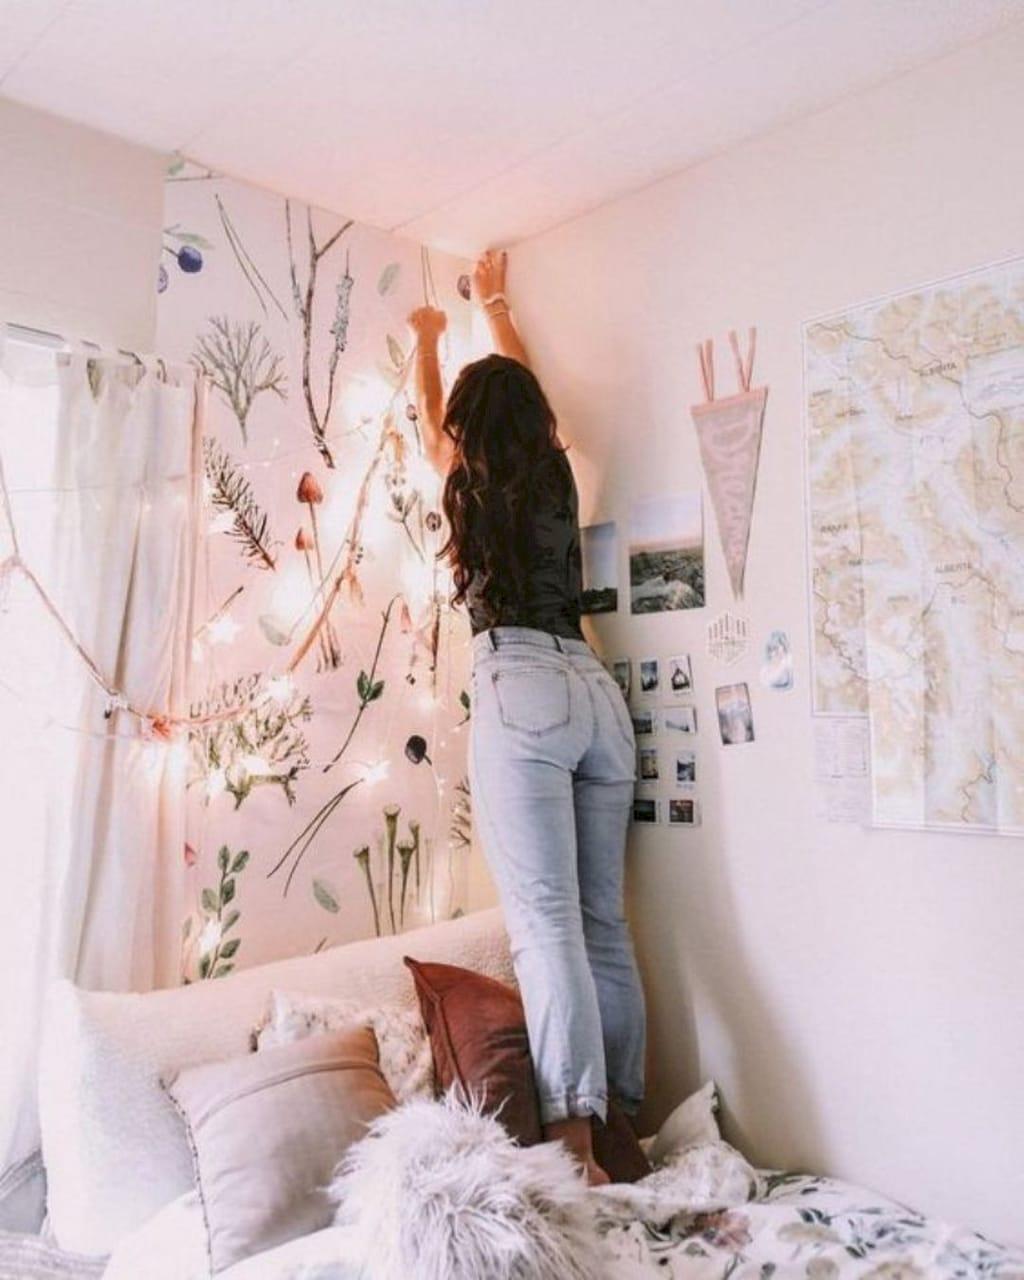 Dorm Room Decorating Ideas 5 on We Heart It